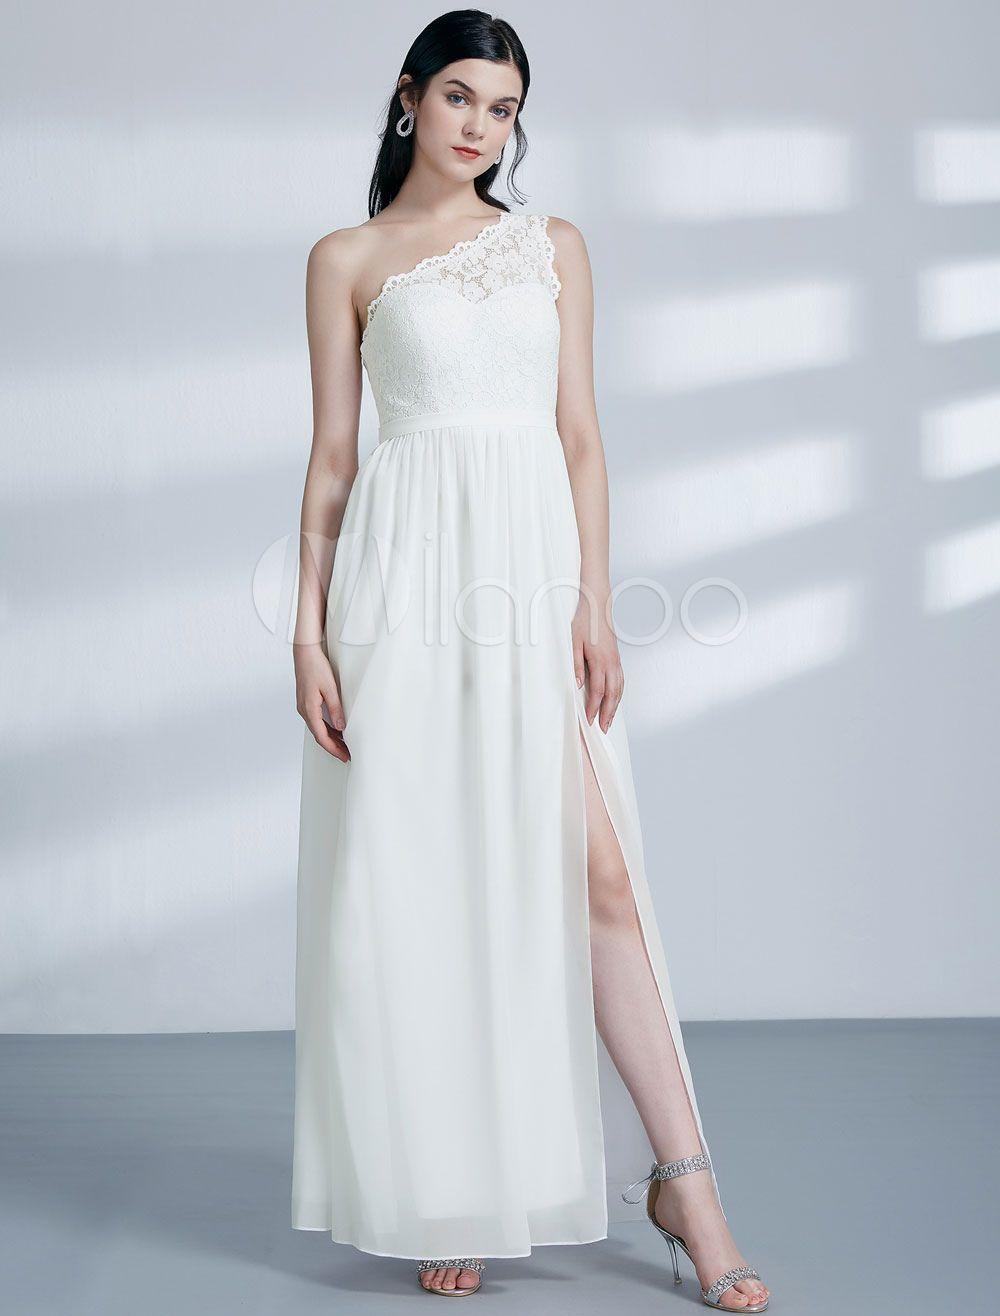 White bridesmaid dresses lace chiffon split one shoulder long prom